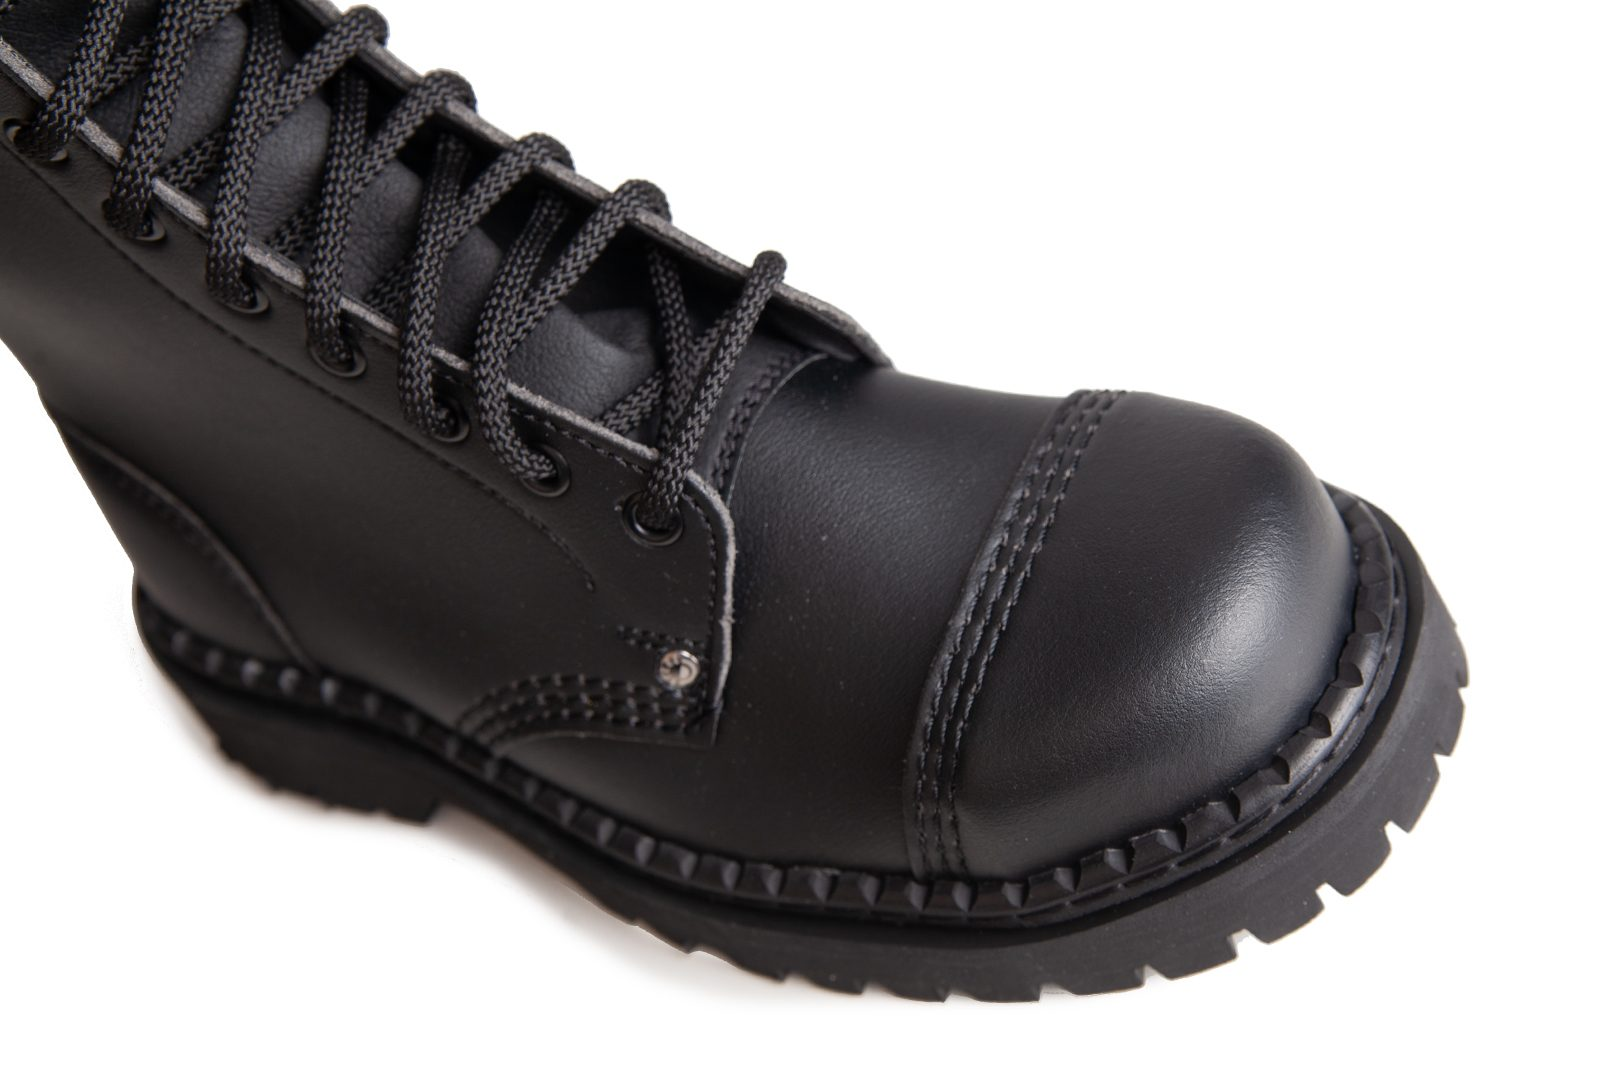 14 Eye Toe Vegan Boots Black